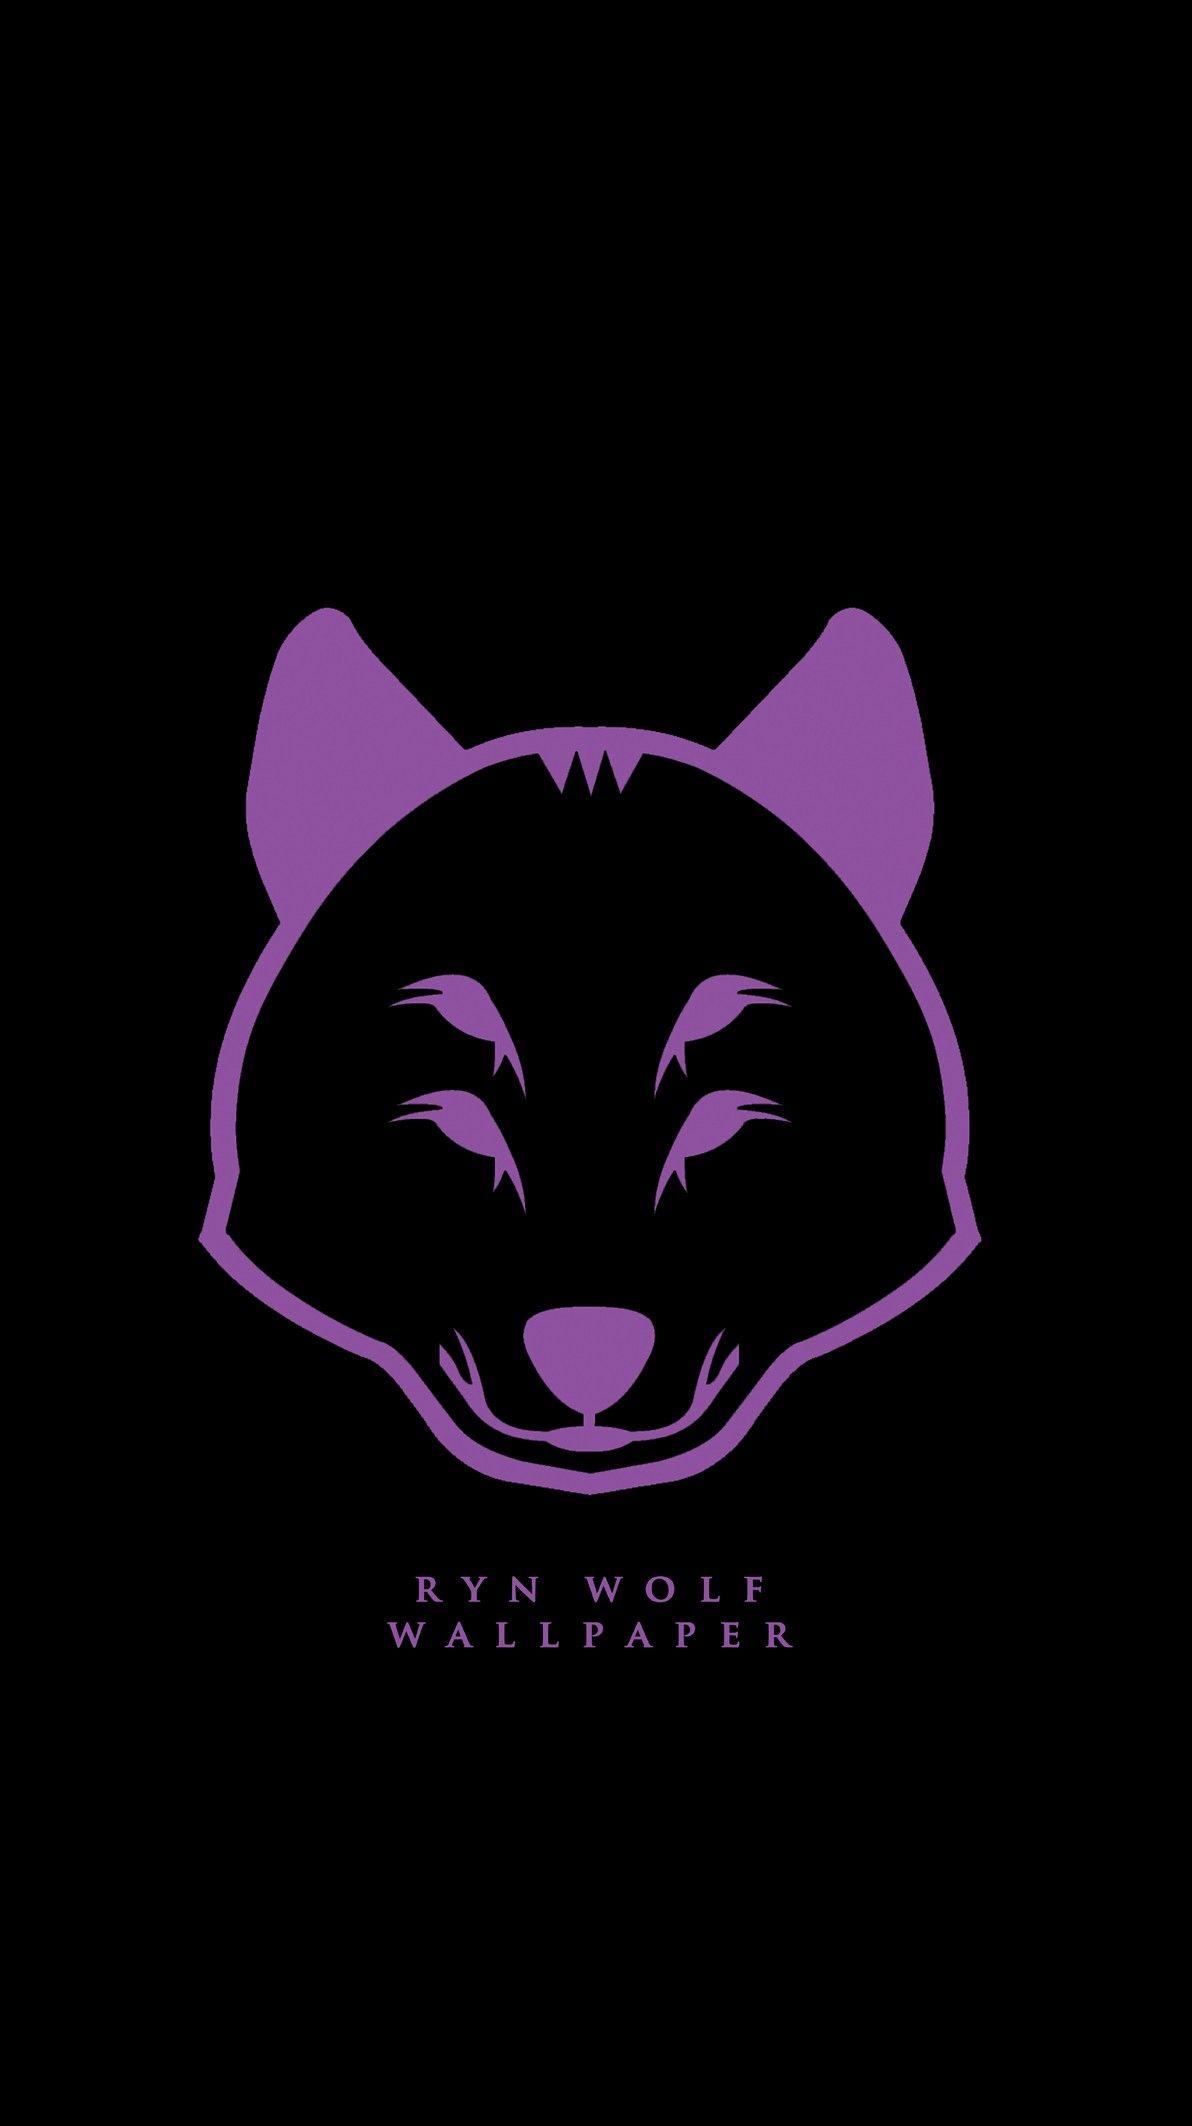 Ryn Wolf Logo Wallpaper